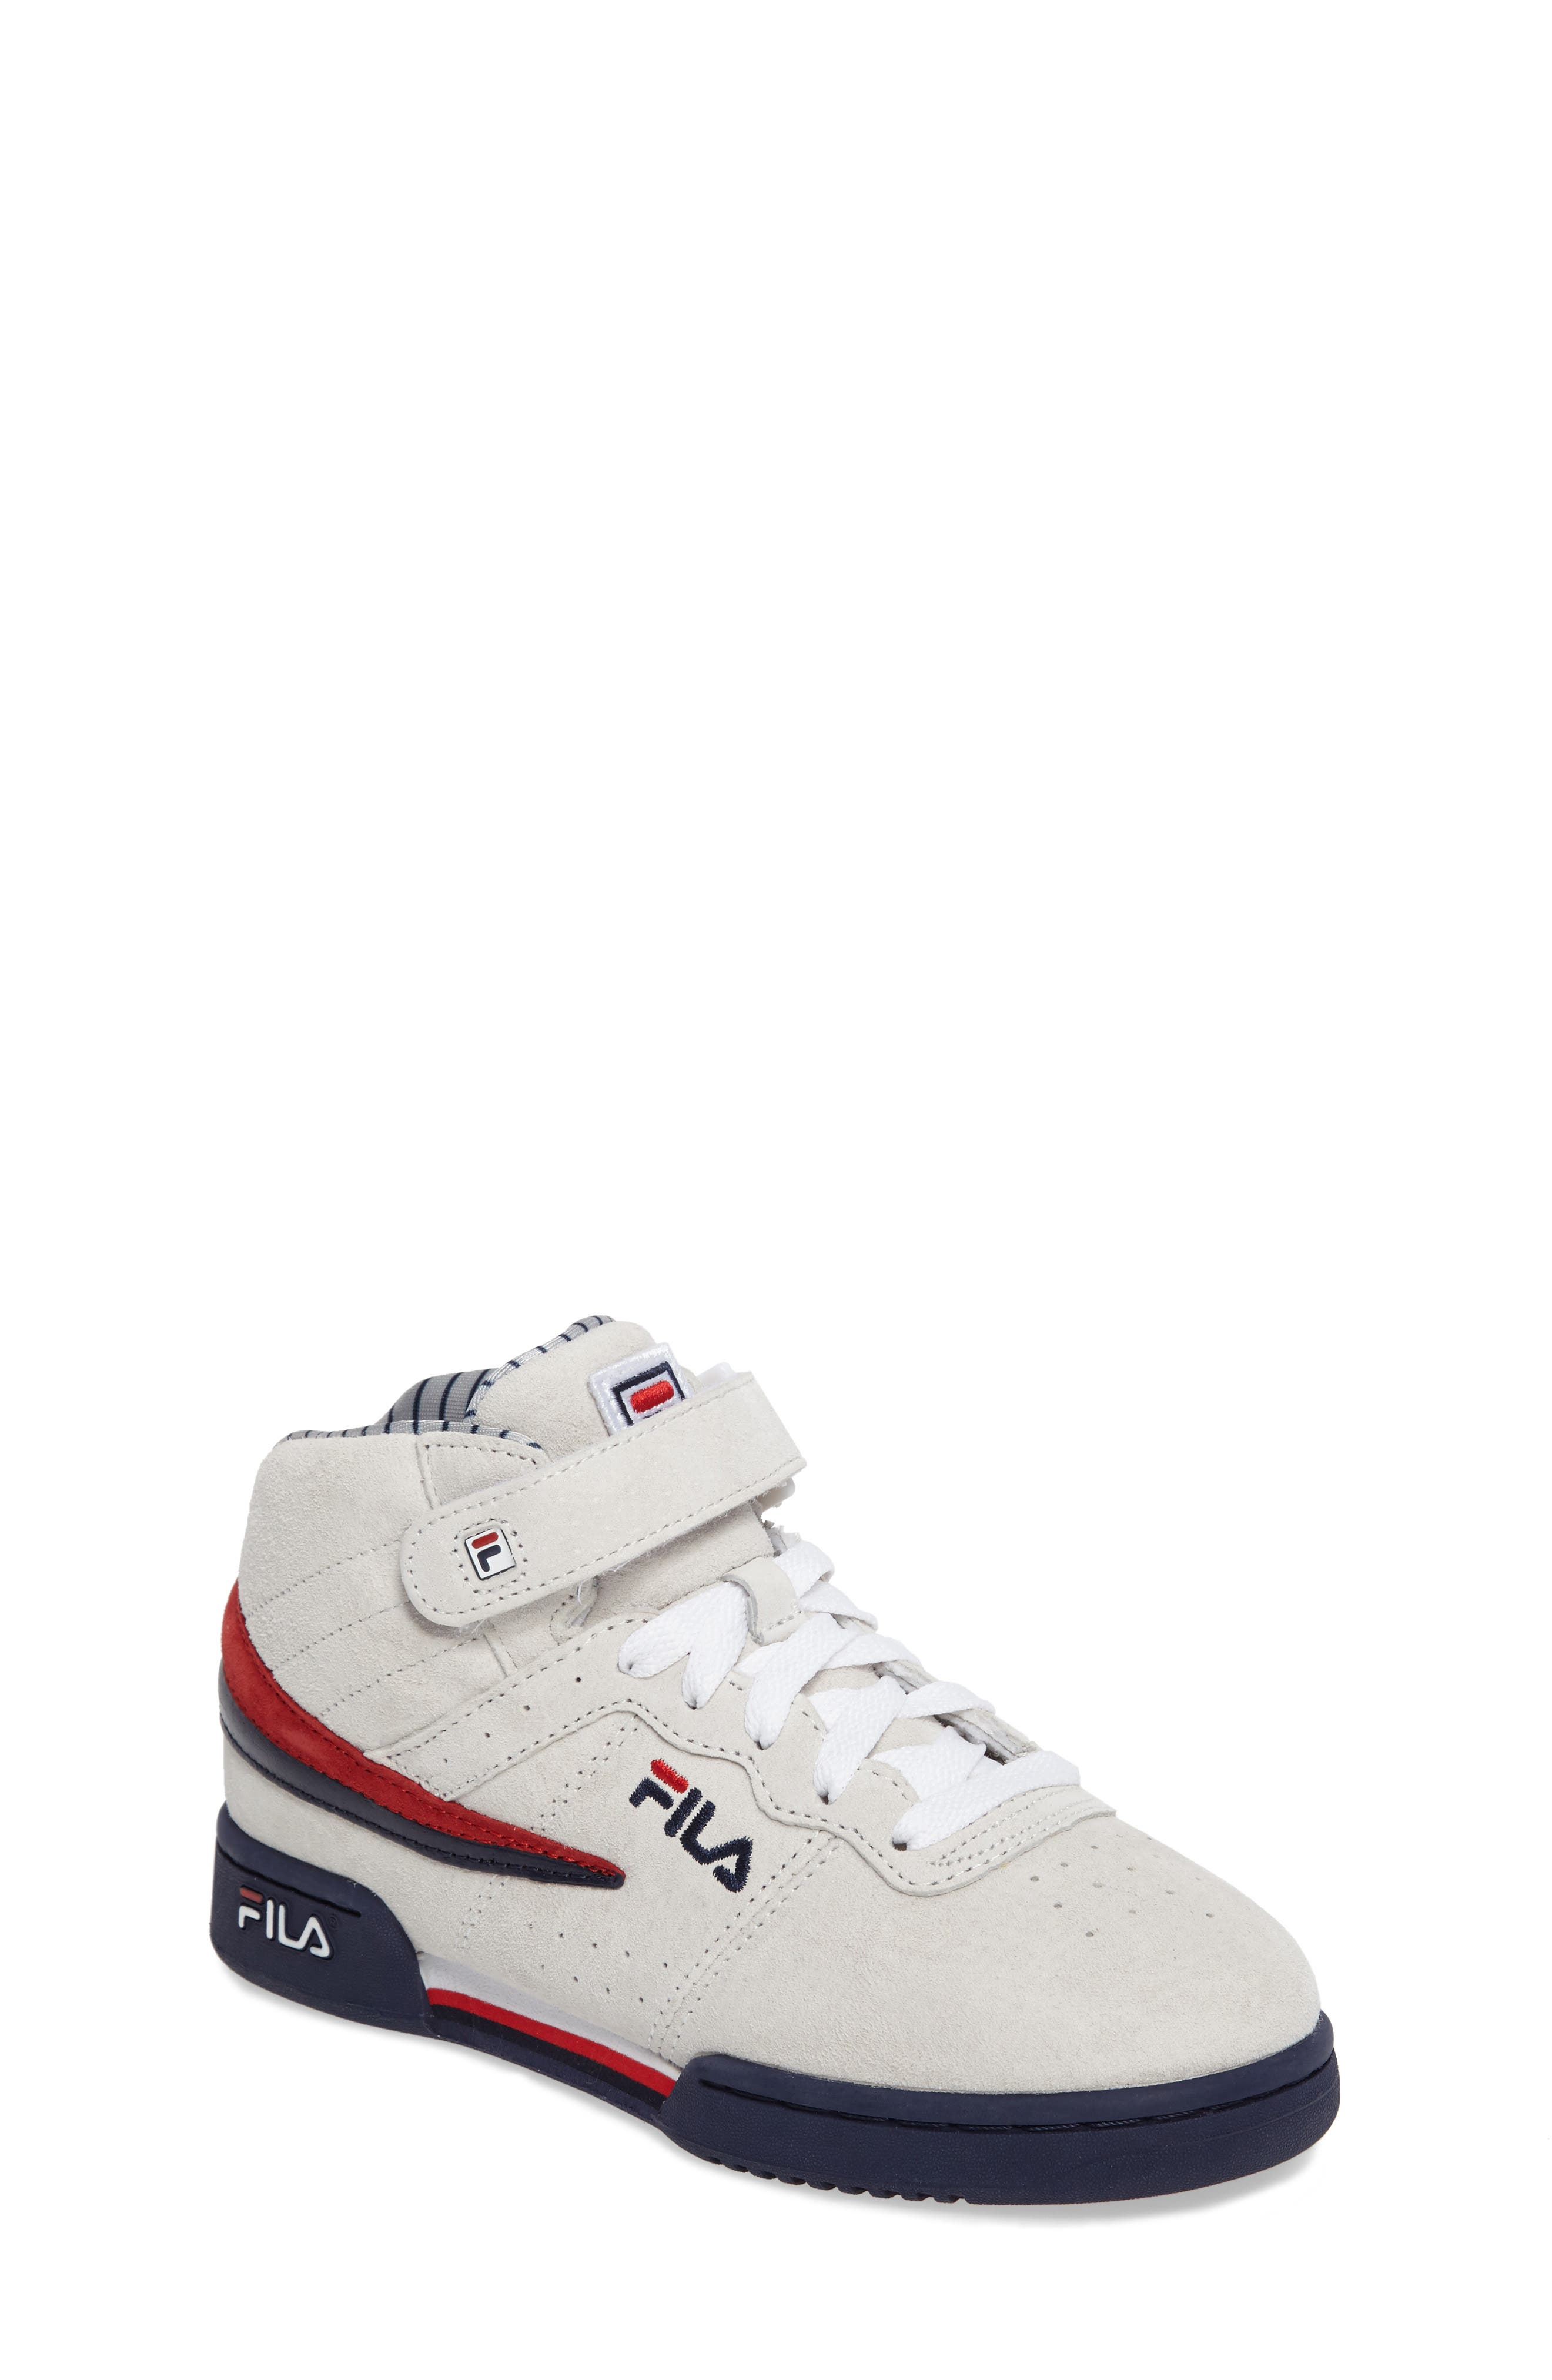 FILA, F-13 Mid Pinstripe Sneaker, Main thumbnail 1, color, 150